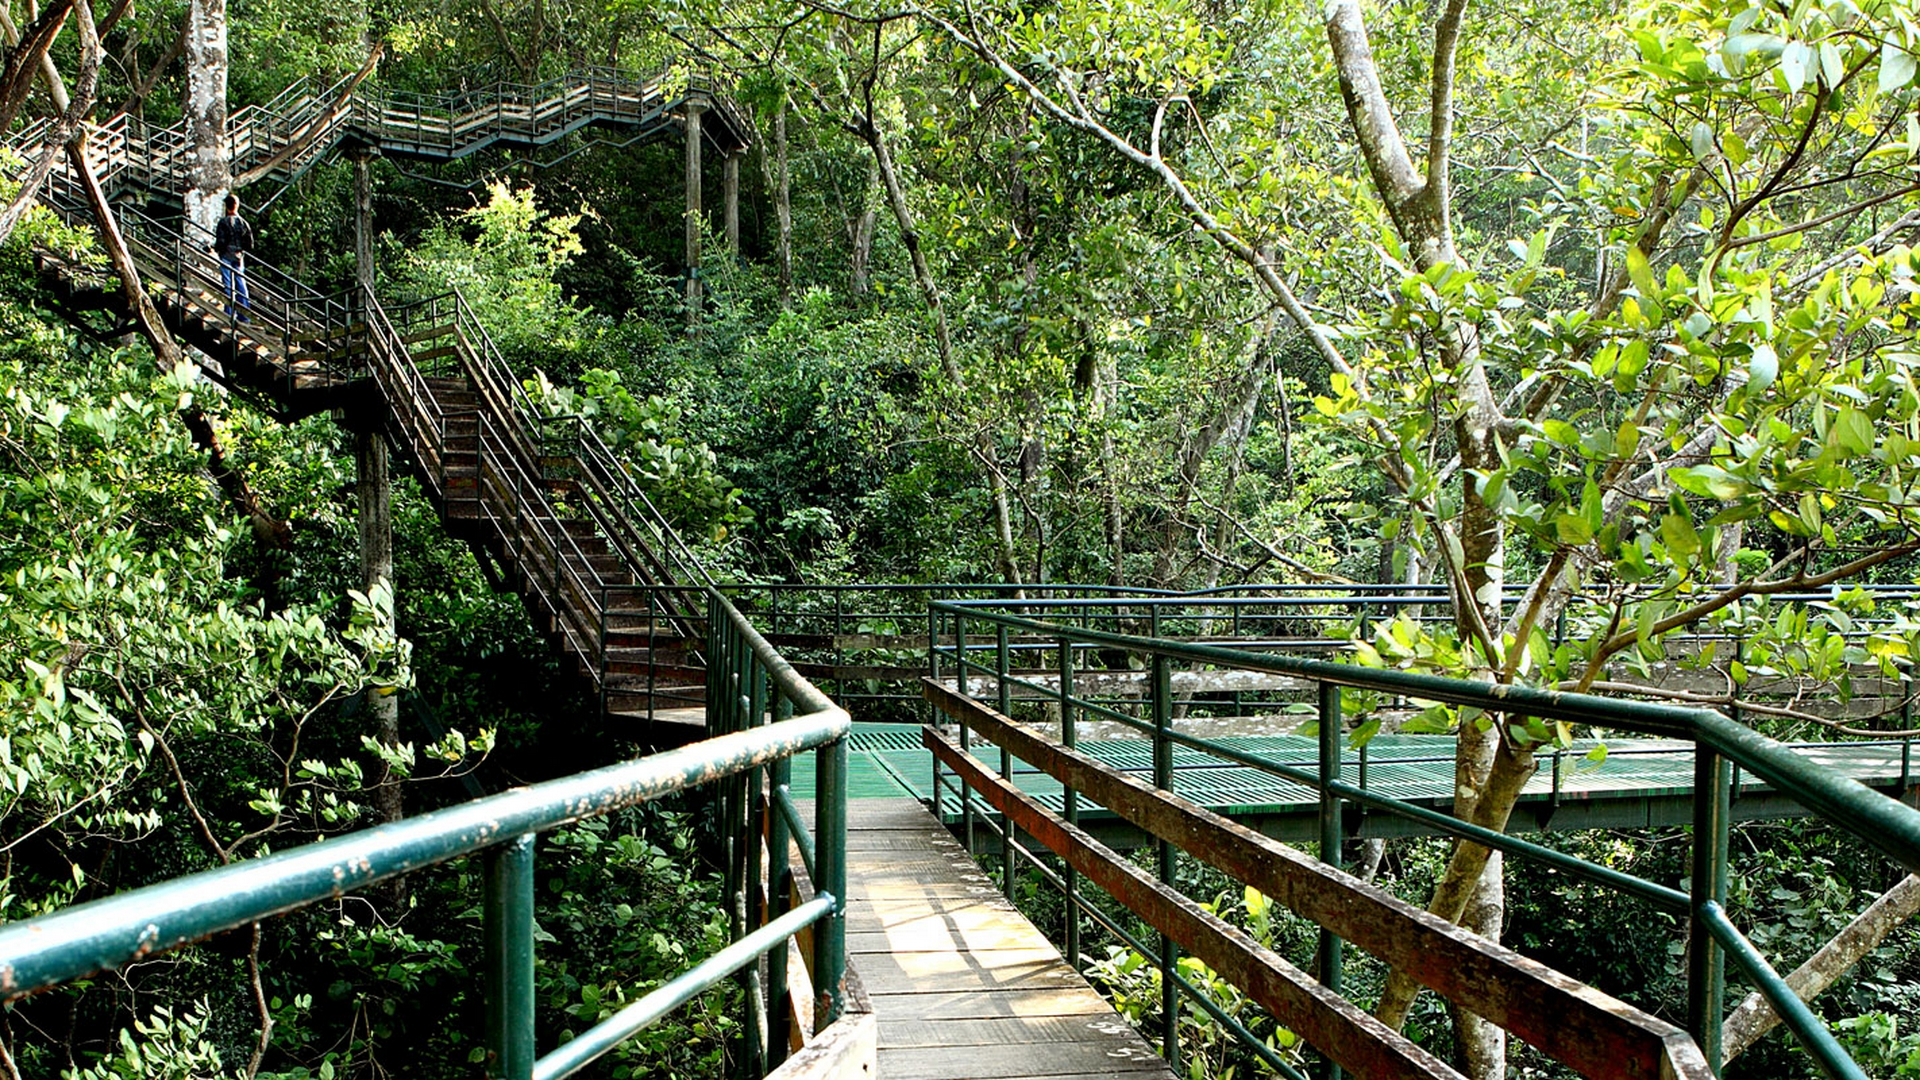 Thenmala Eco Tourism in Kollam